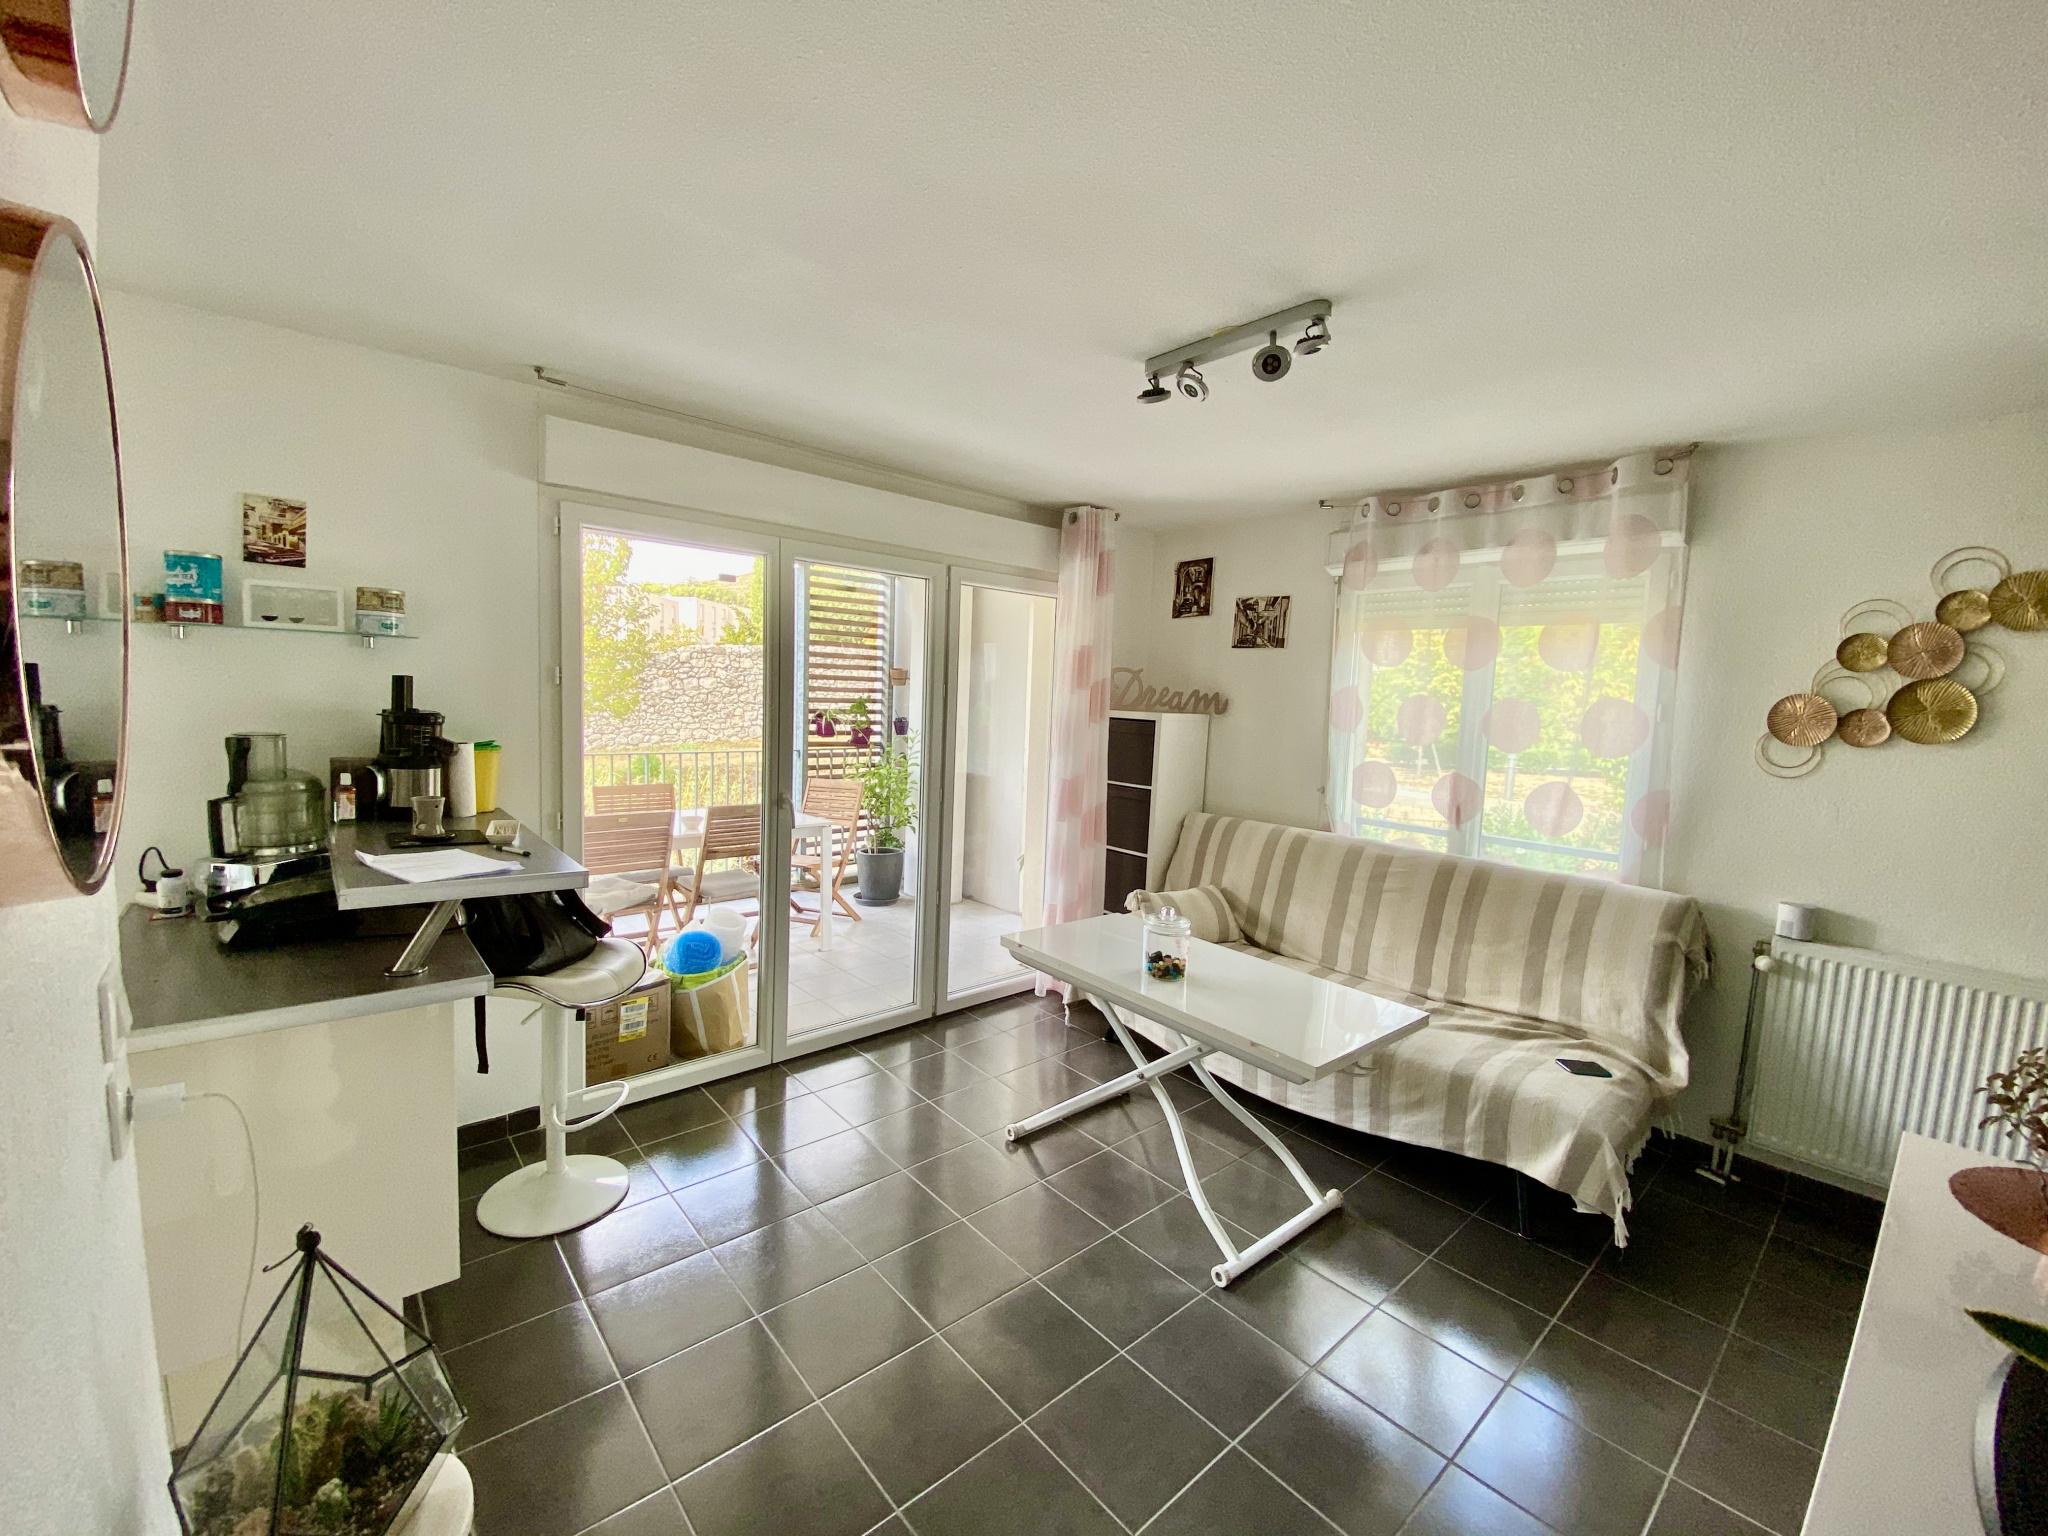 Appartement T2, Sainte-Marthe,13014